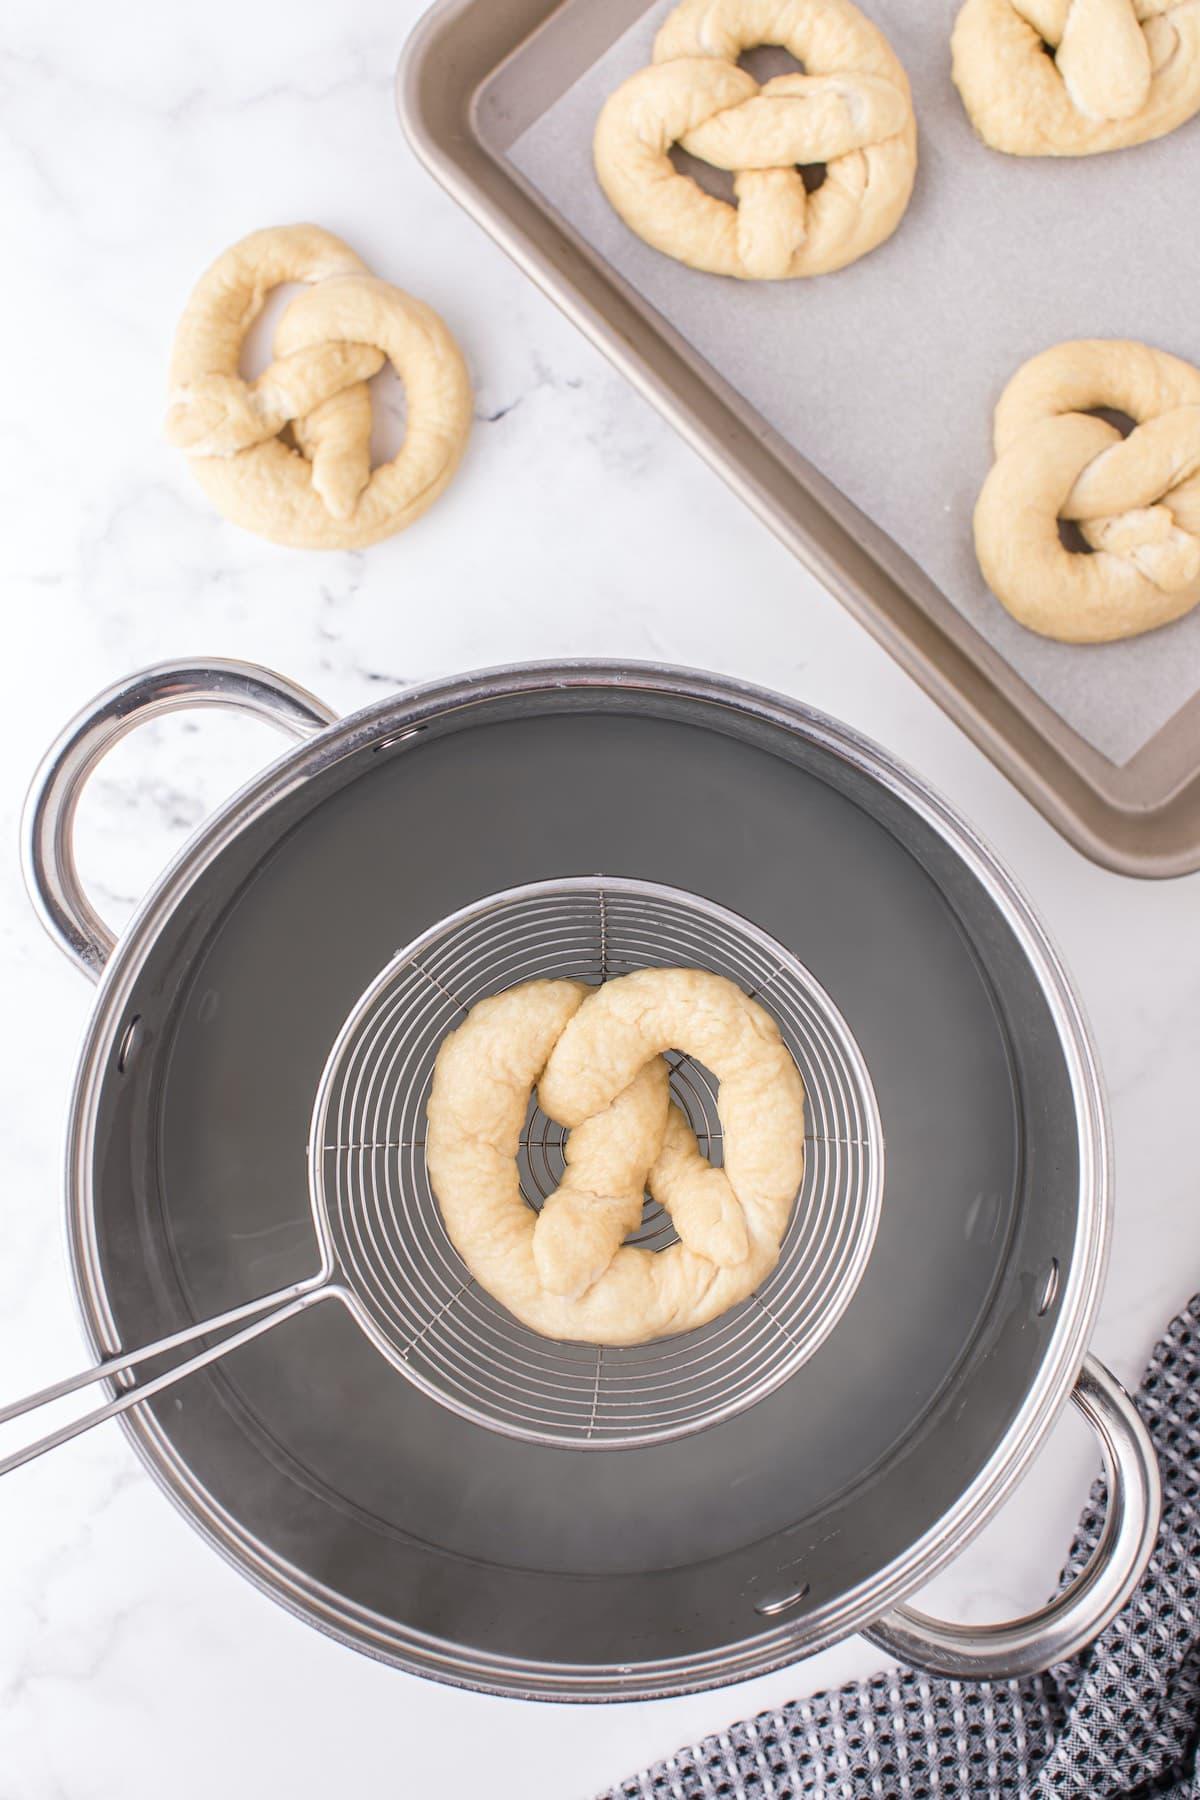 boil the dough in baking soda water